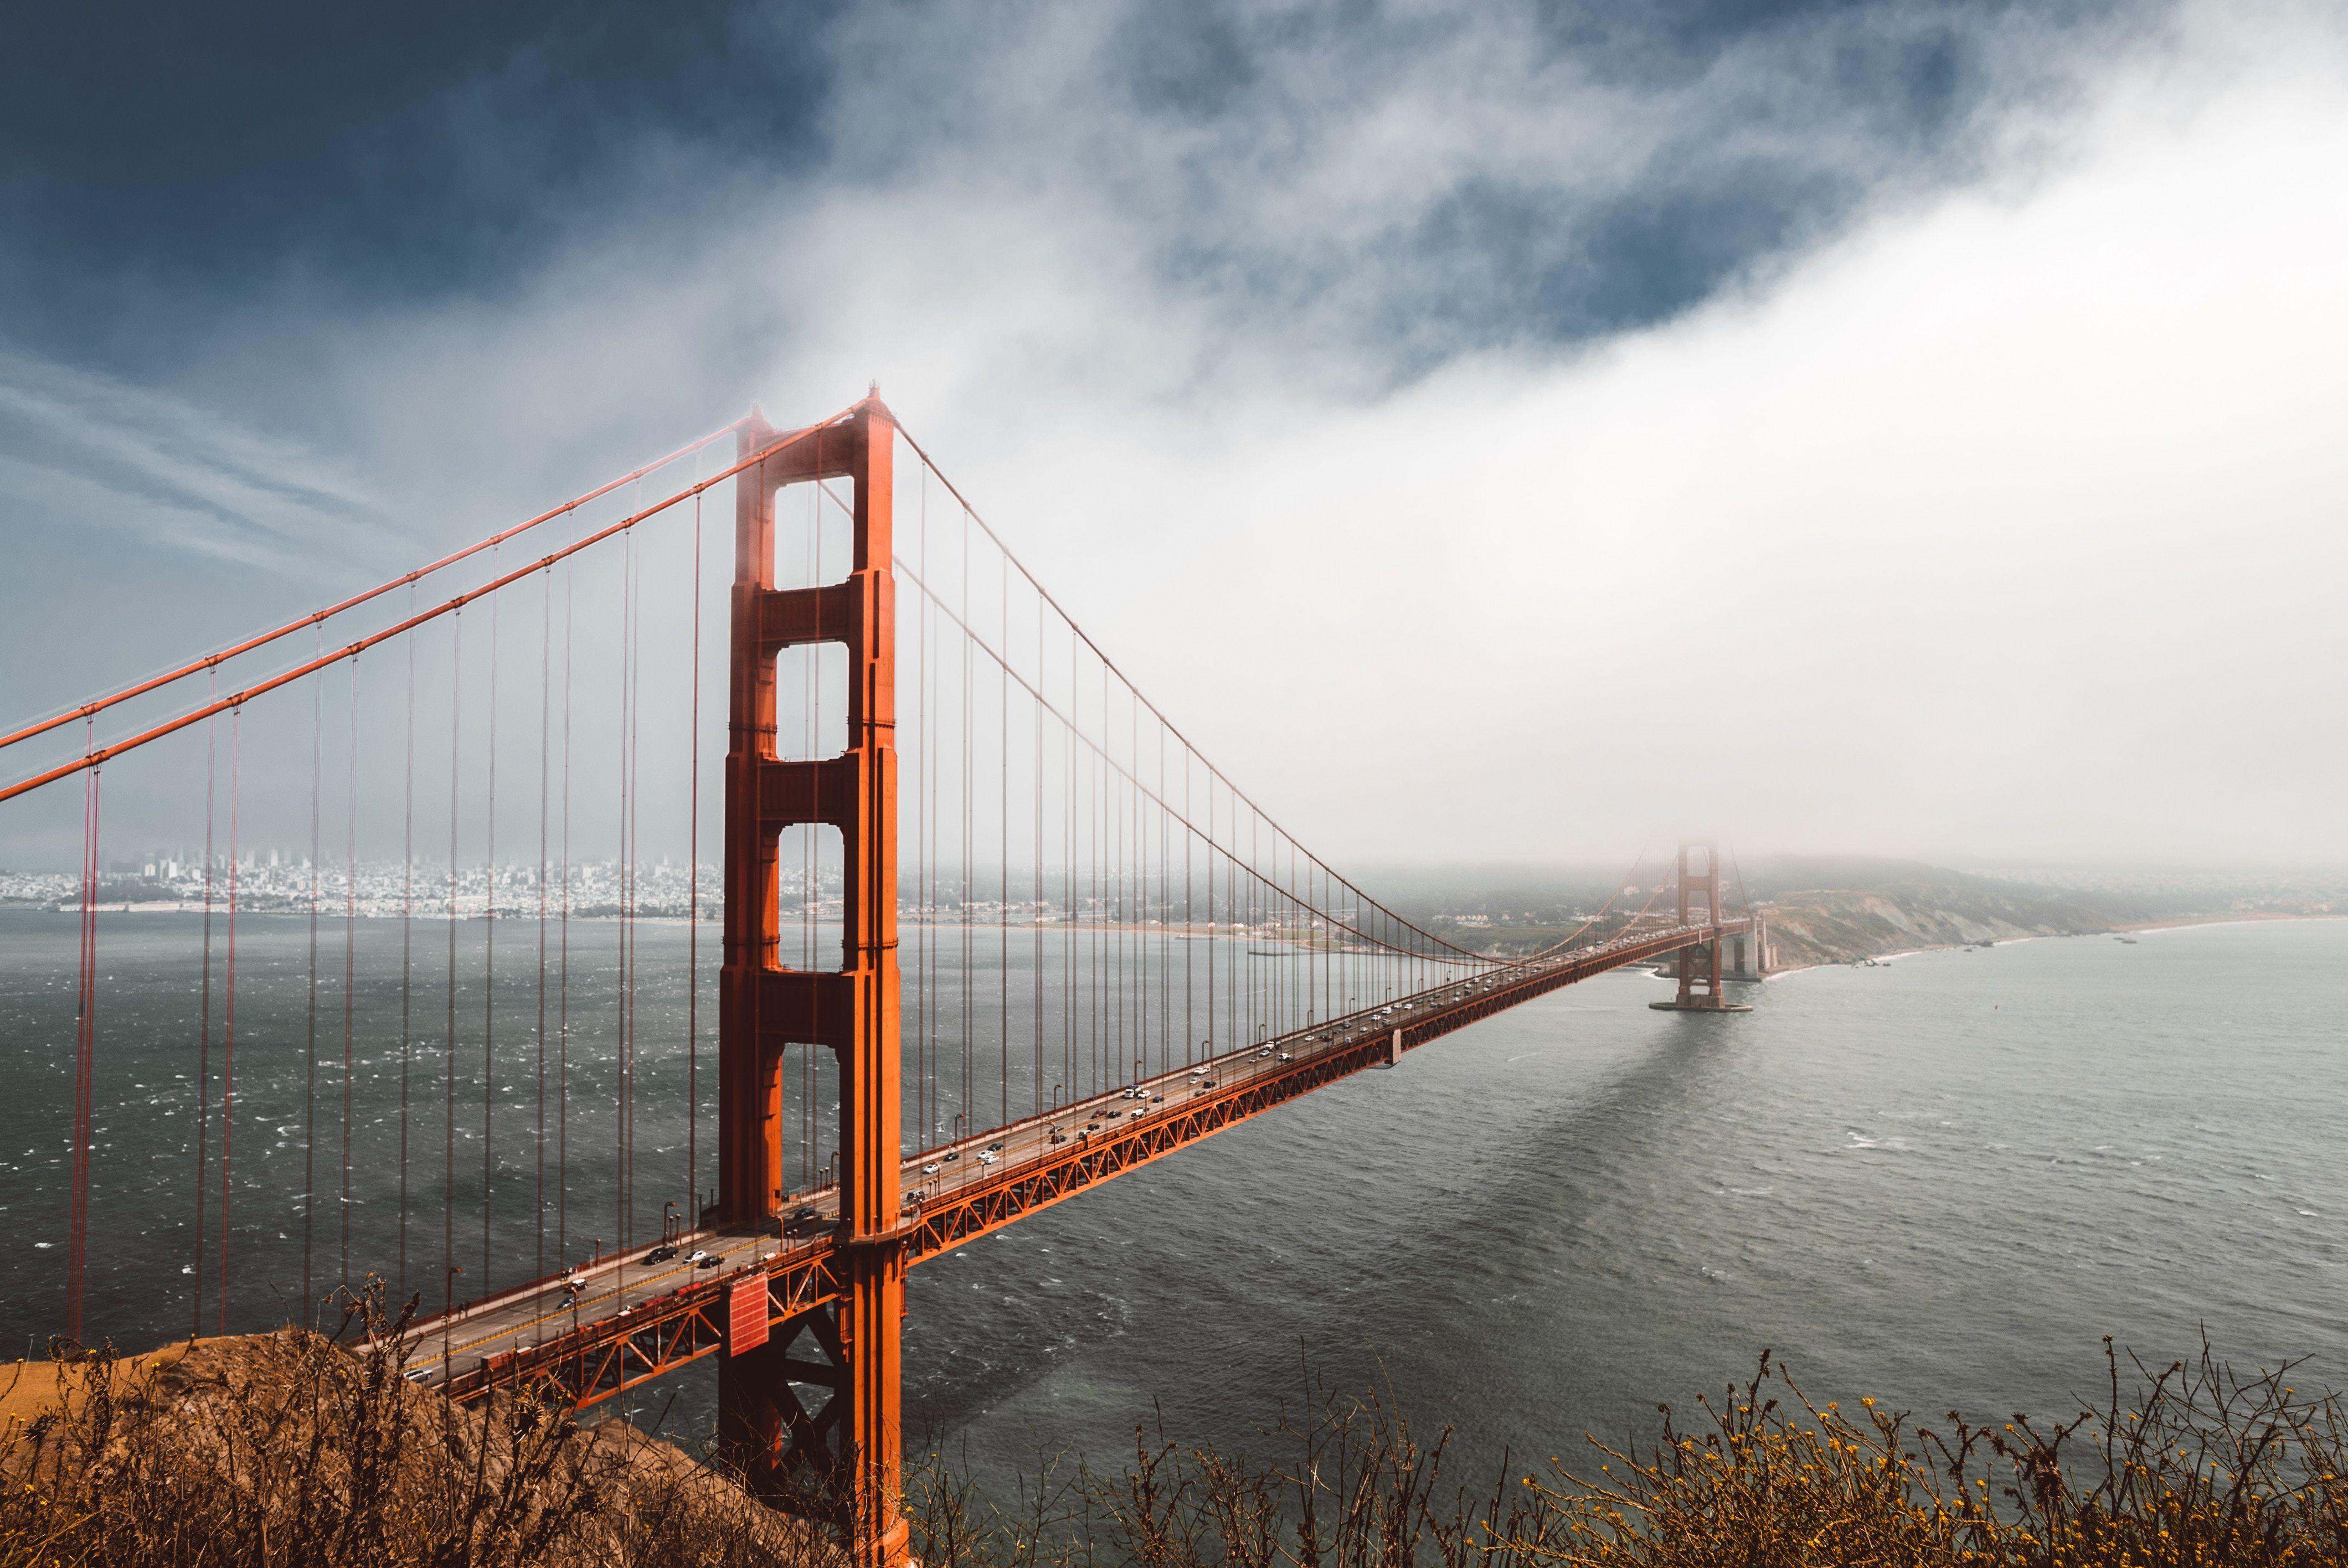 Golden Gate Bridge charter bus rentals